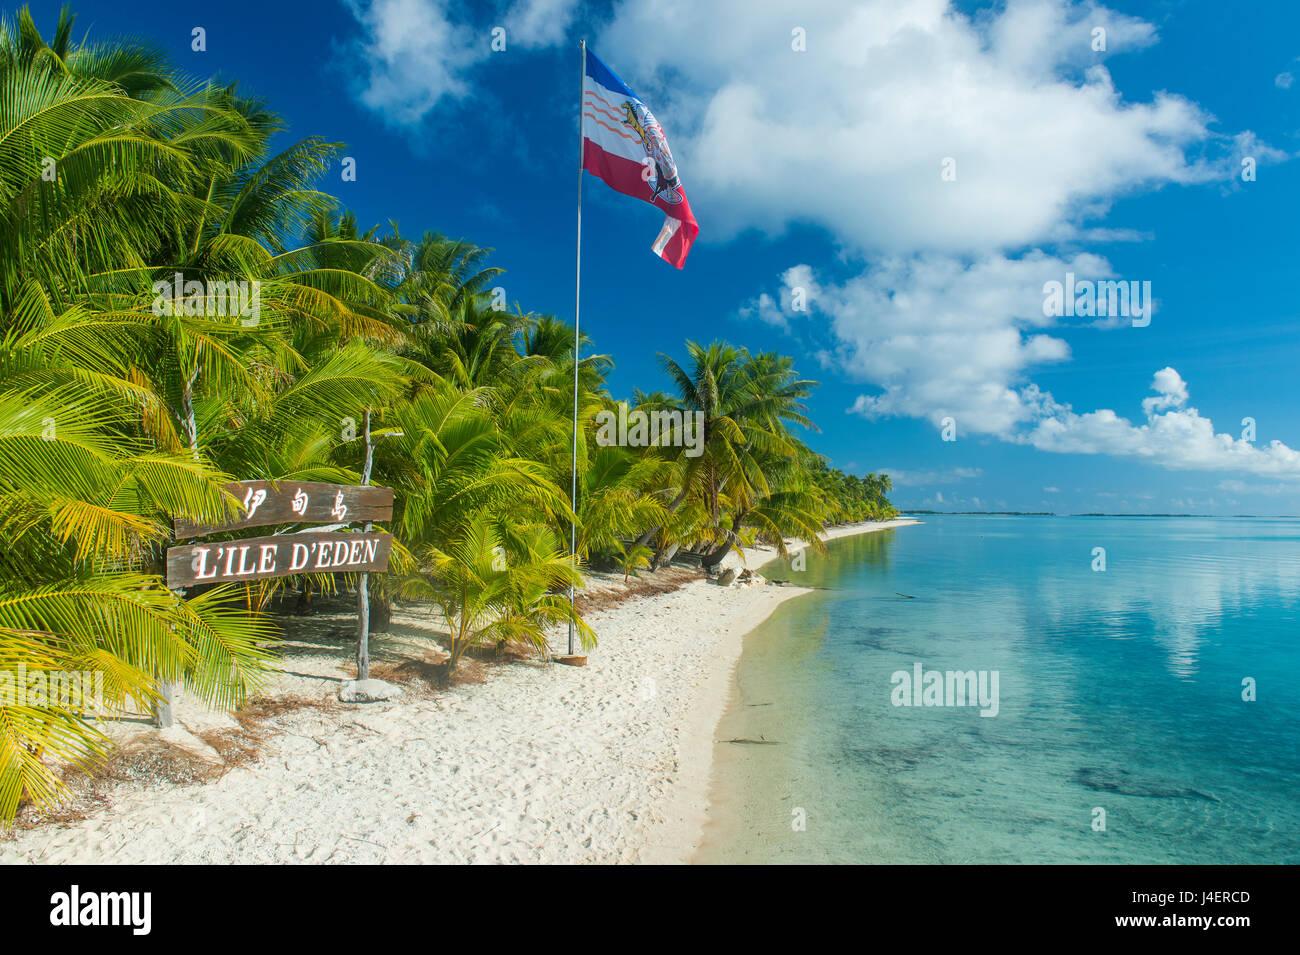 Beautiful palm fringed white sand beach in the turquoise waters of Tikehau, Tuamotus, French Polynesia, Pacific - Stock Image